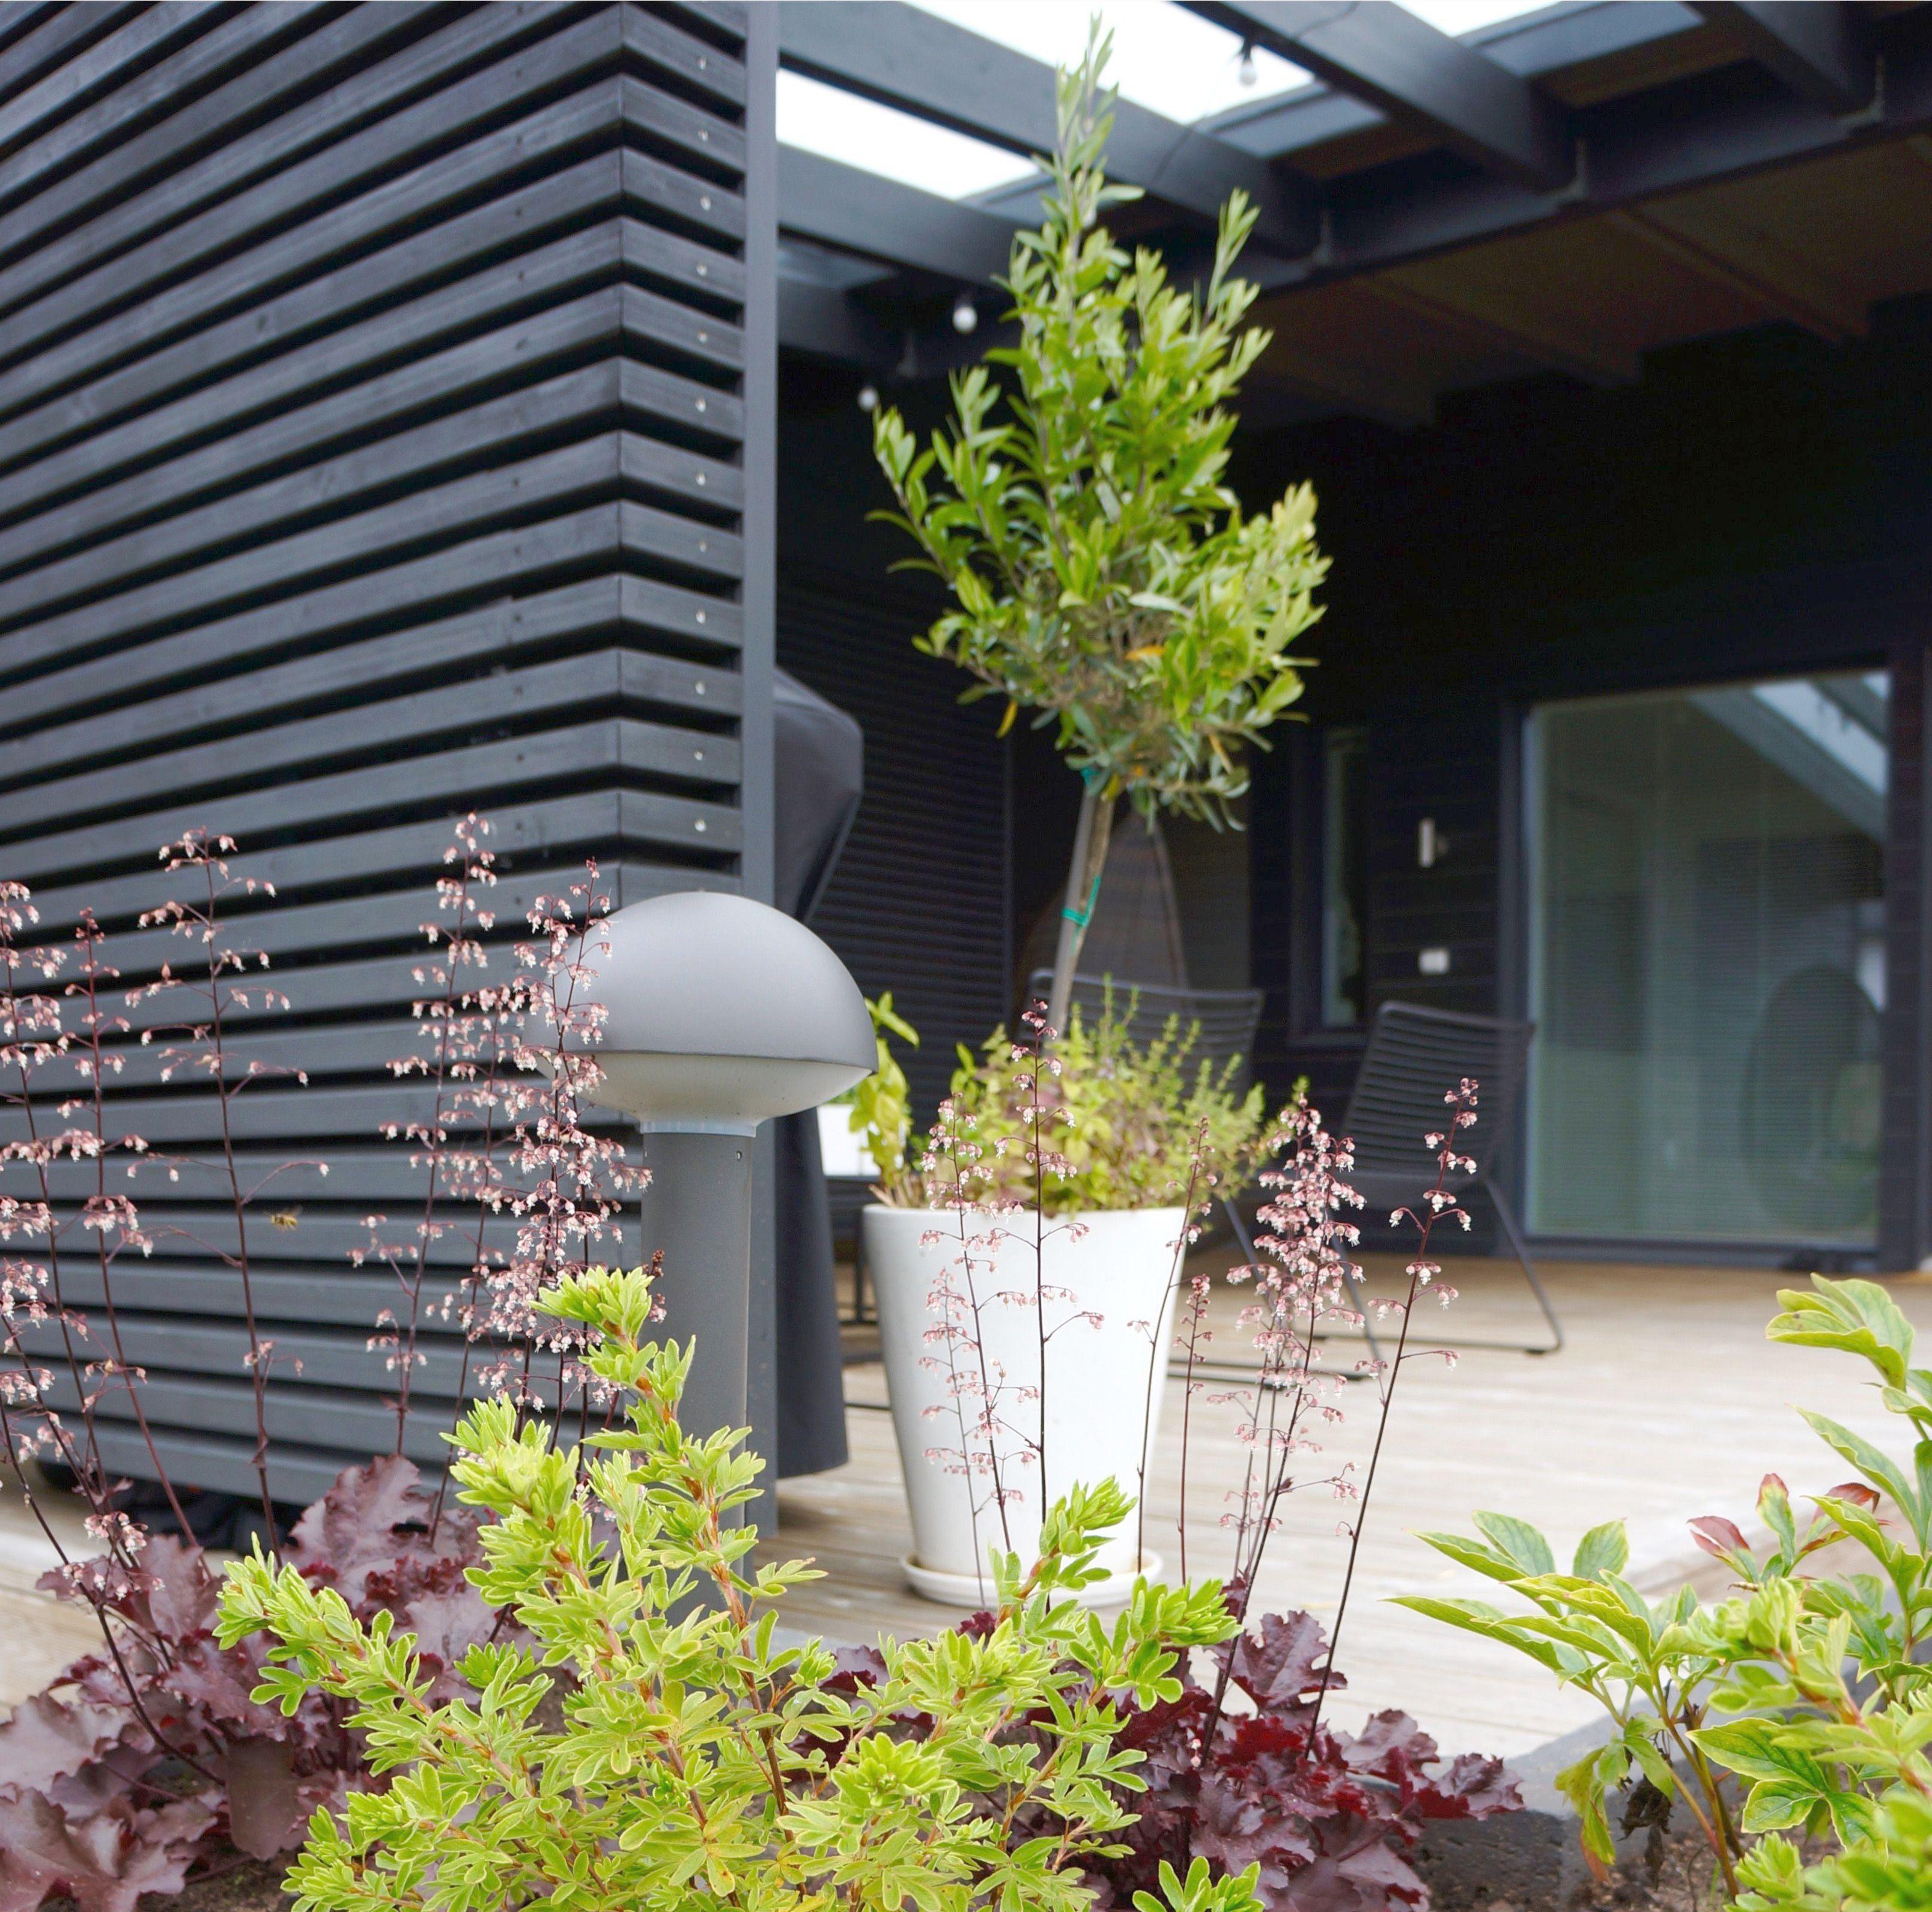 Landscape Gardening Courses Near Me, Landscape Gardening ... on Backyard Landscape Designers Near Me id=85629